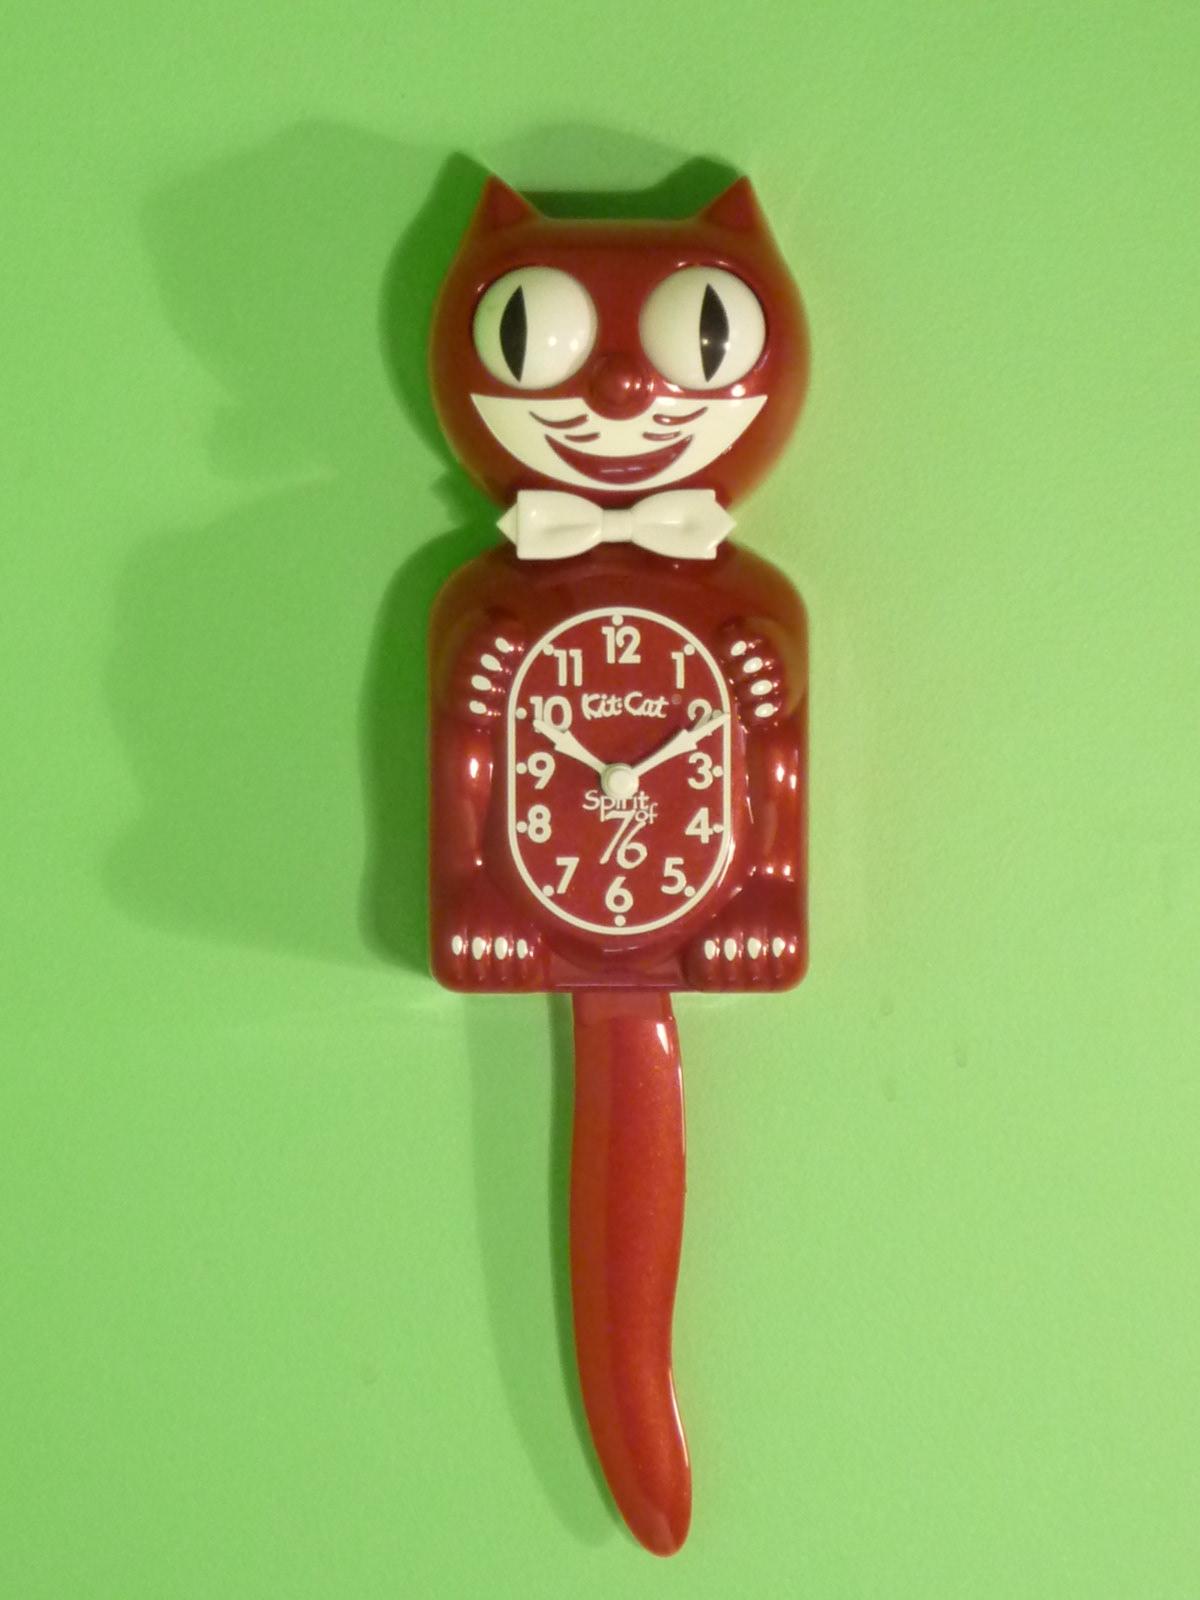 Kit Cat Clock Innovative Product Designs